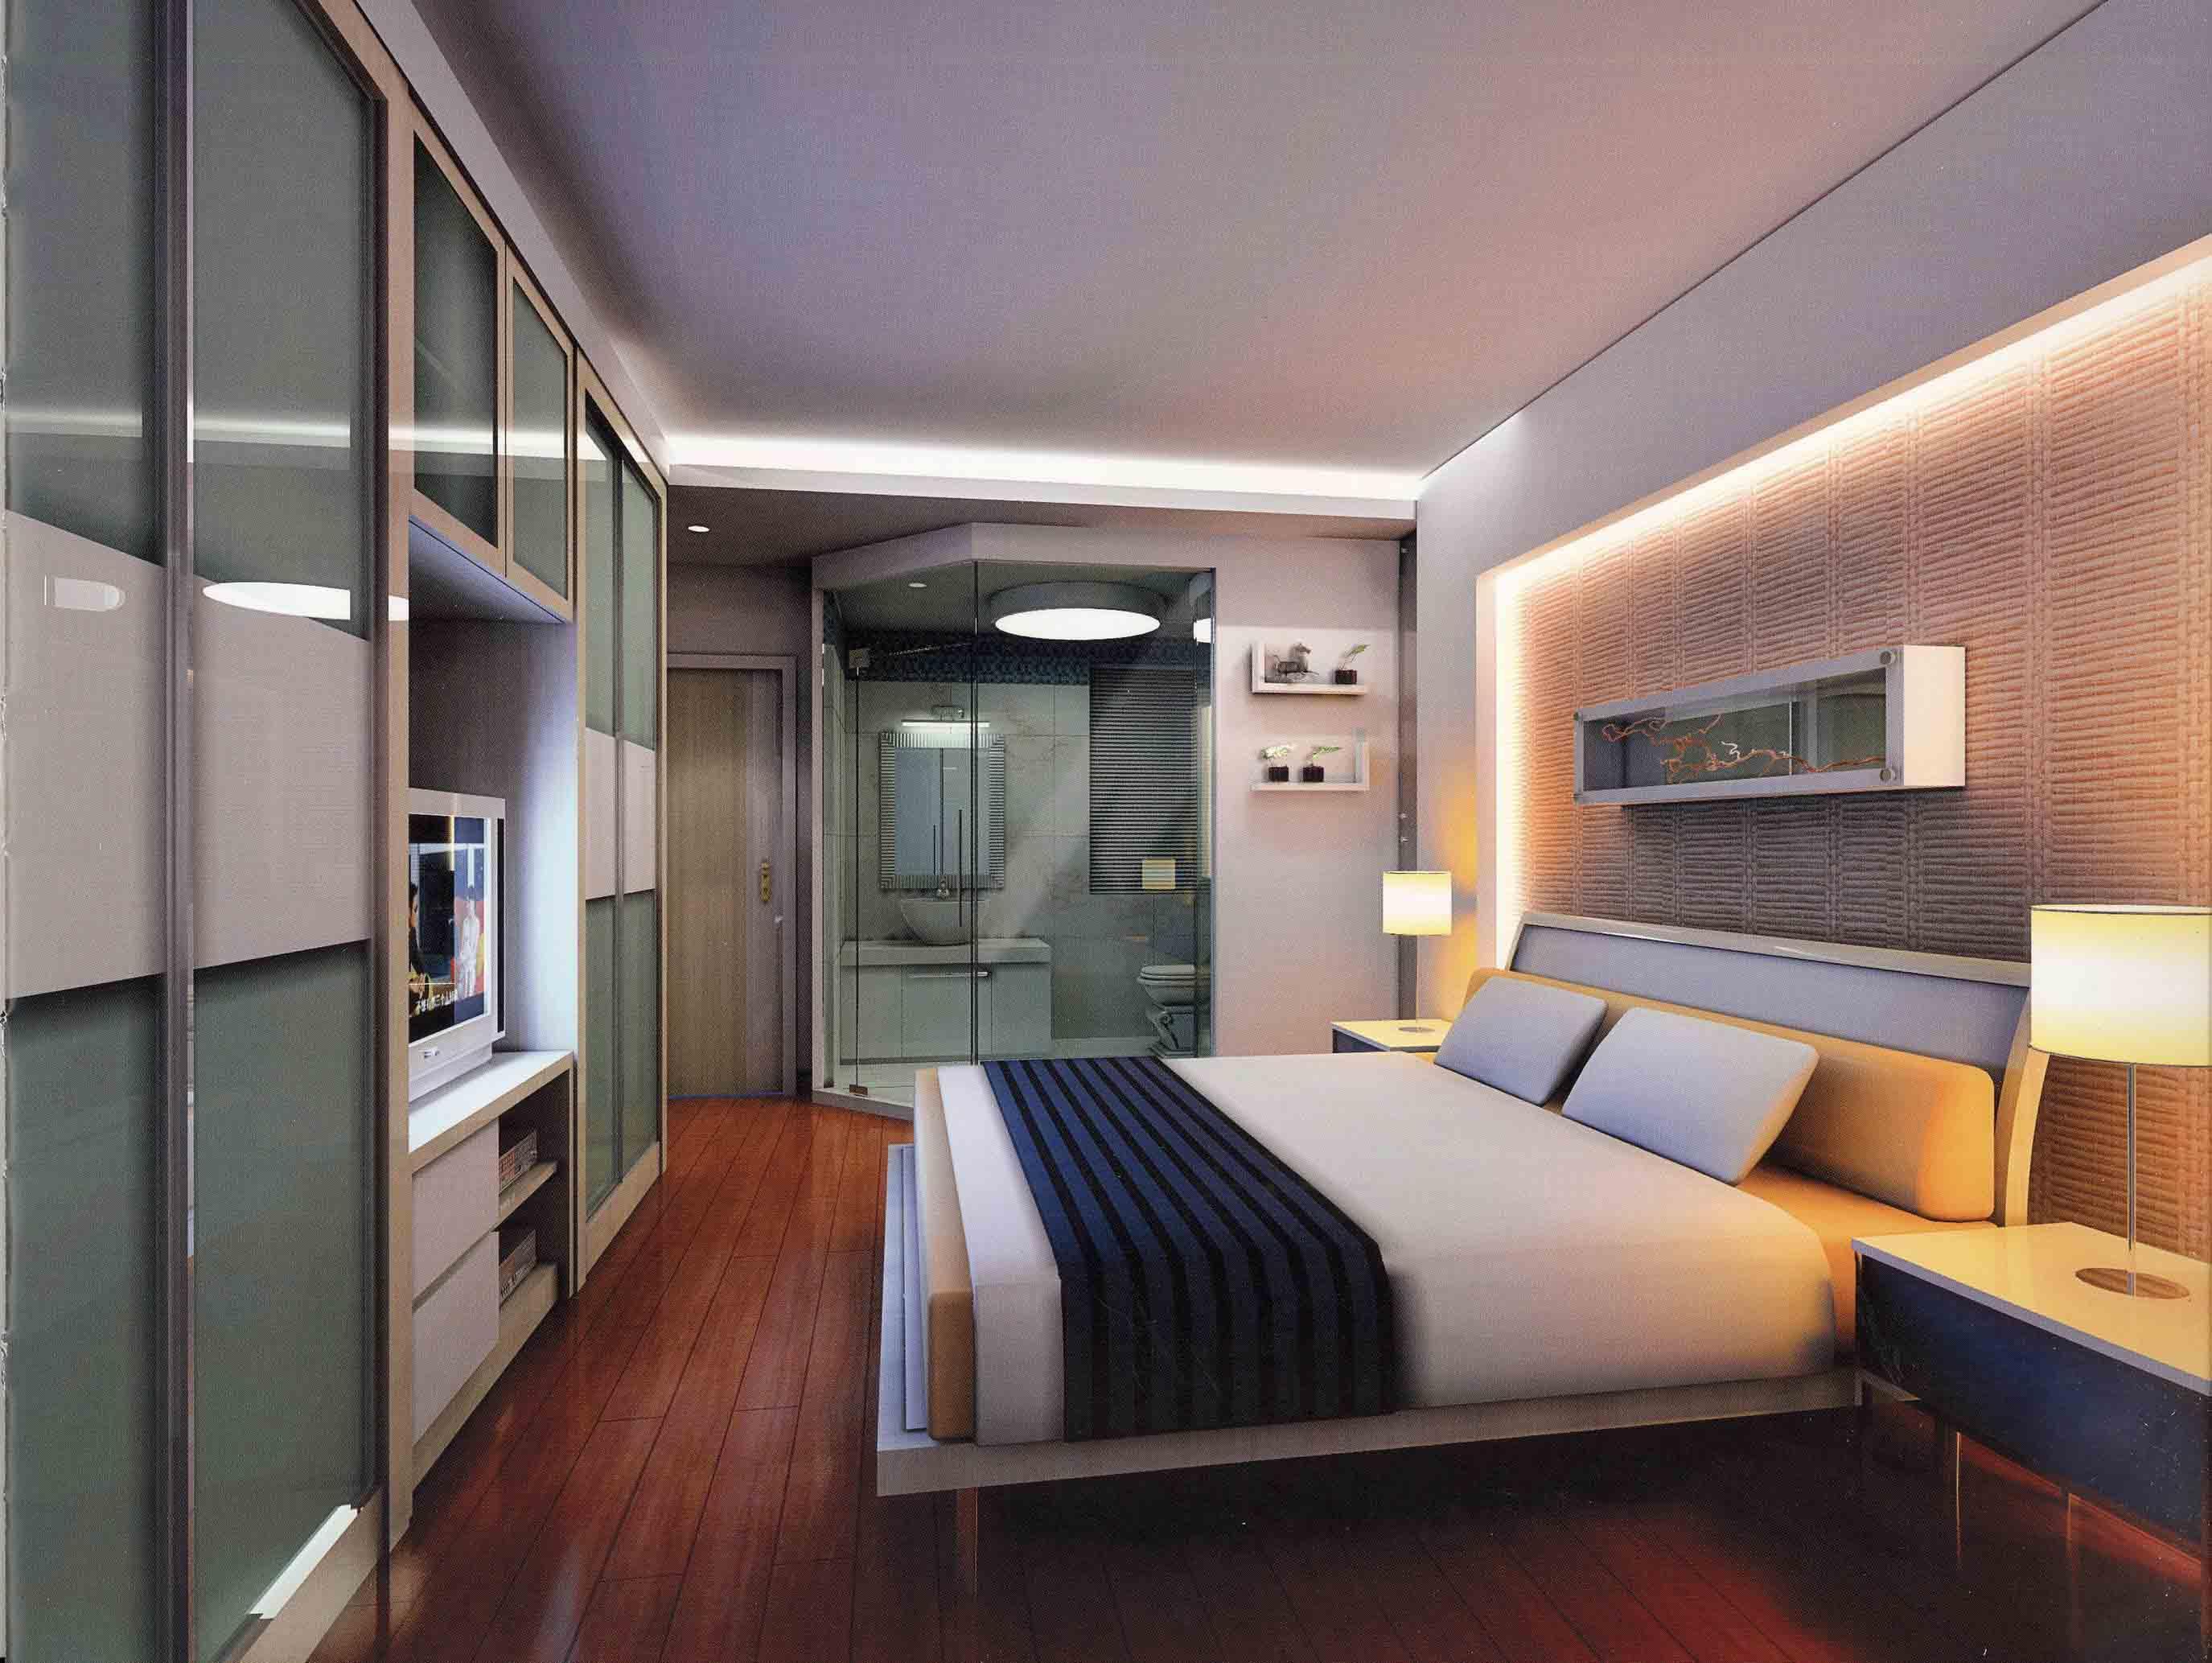 Bedroom wall cladding and lighting - 587.6KB